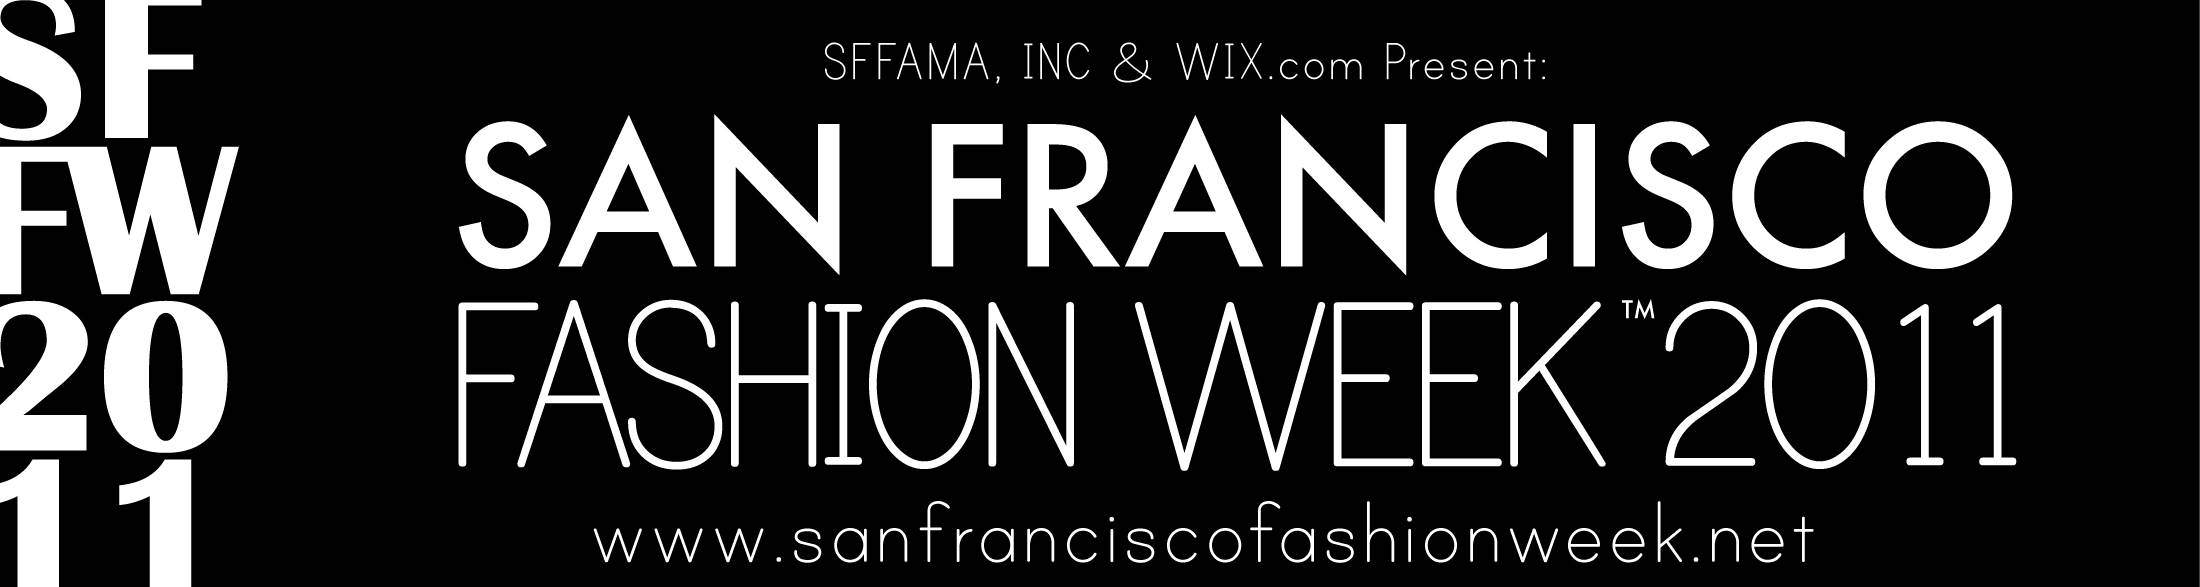 SFFAMAFW2011NEW